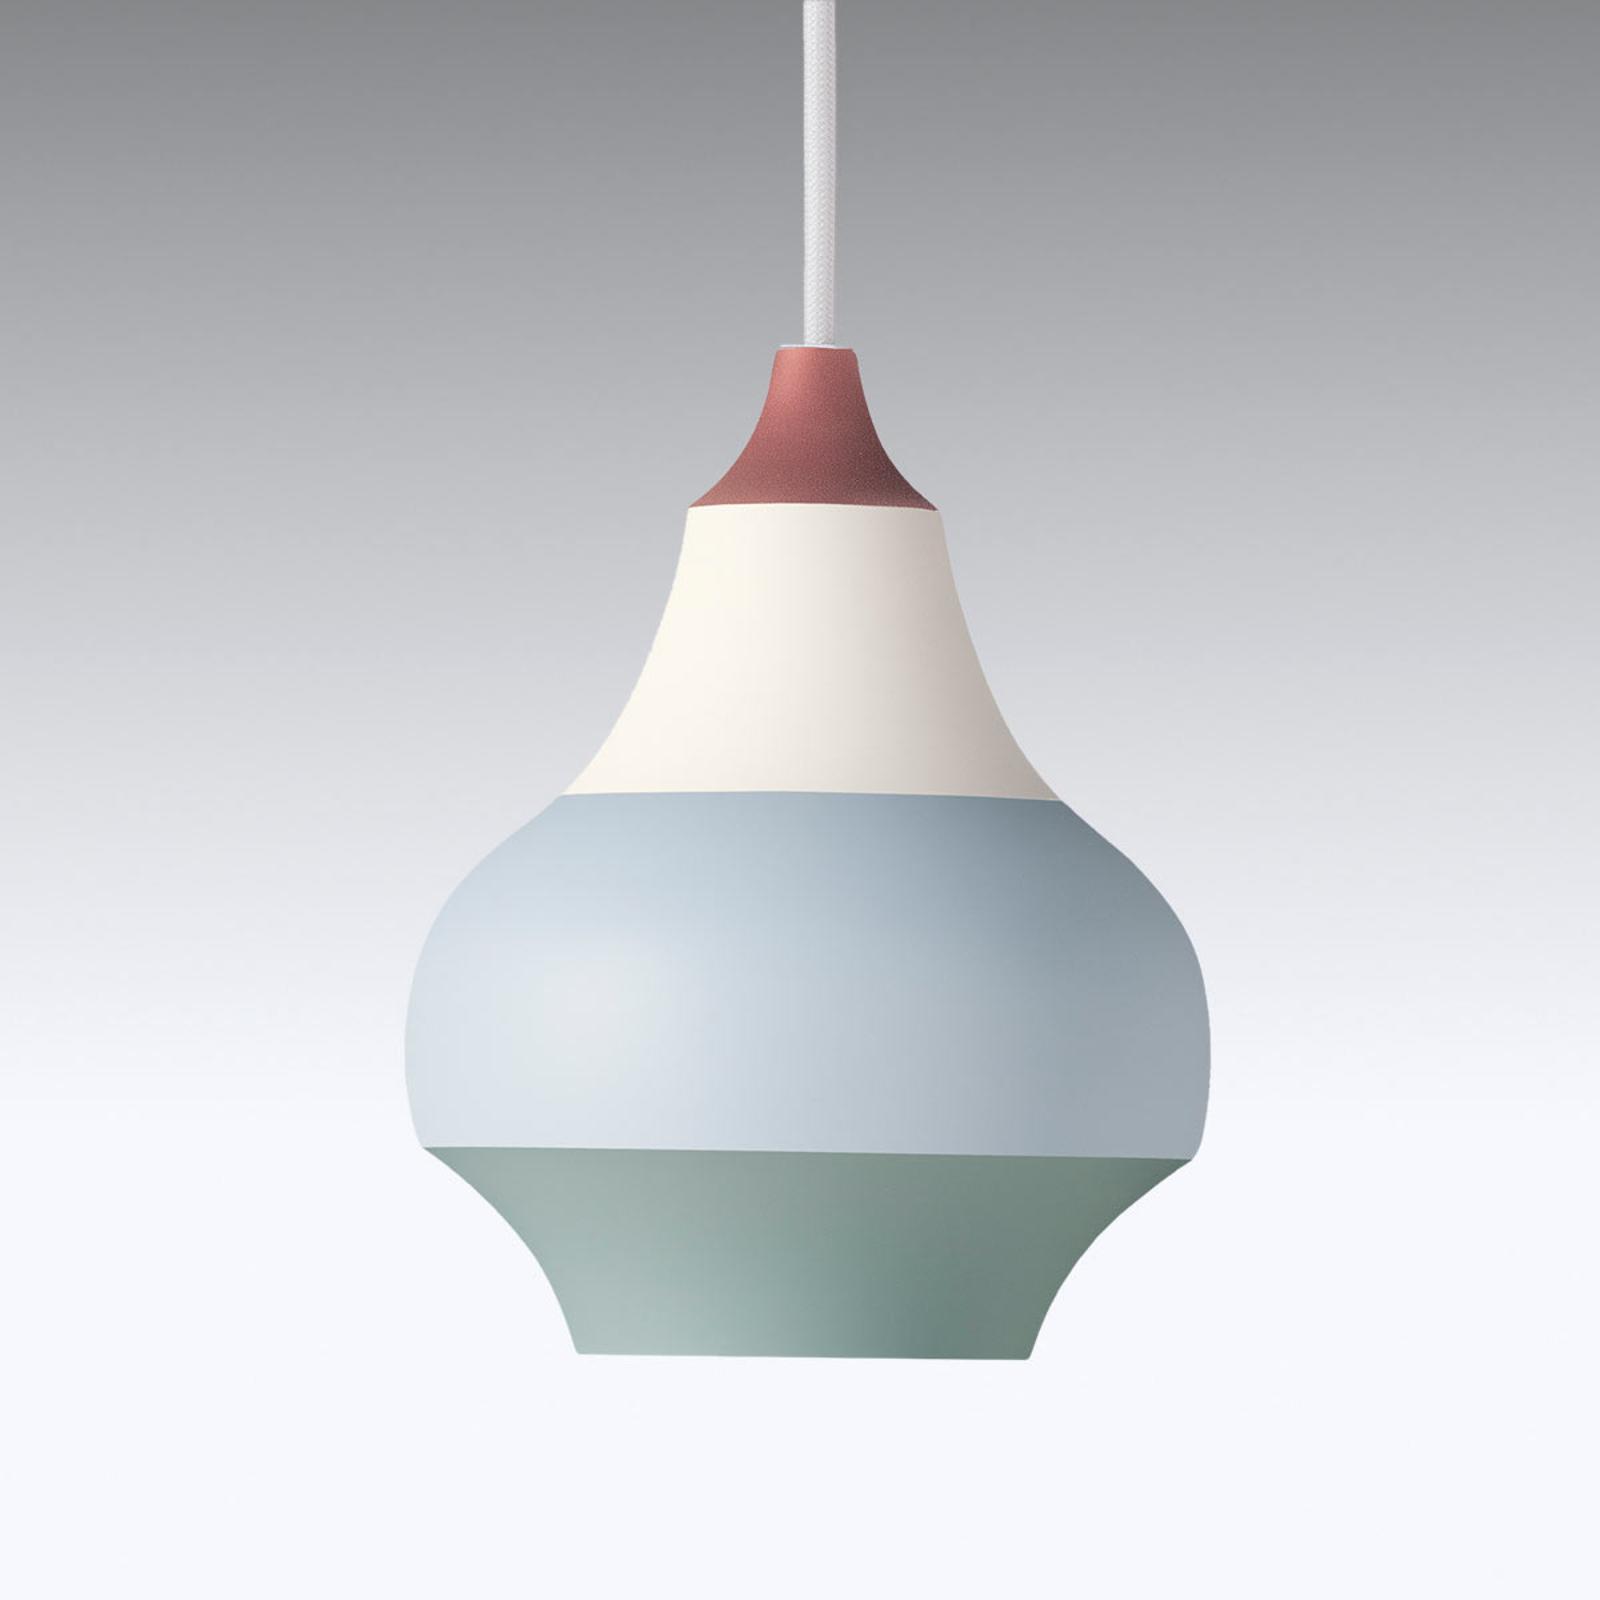 Louis Poulsen Cirque lampada a sospensione 15 cm